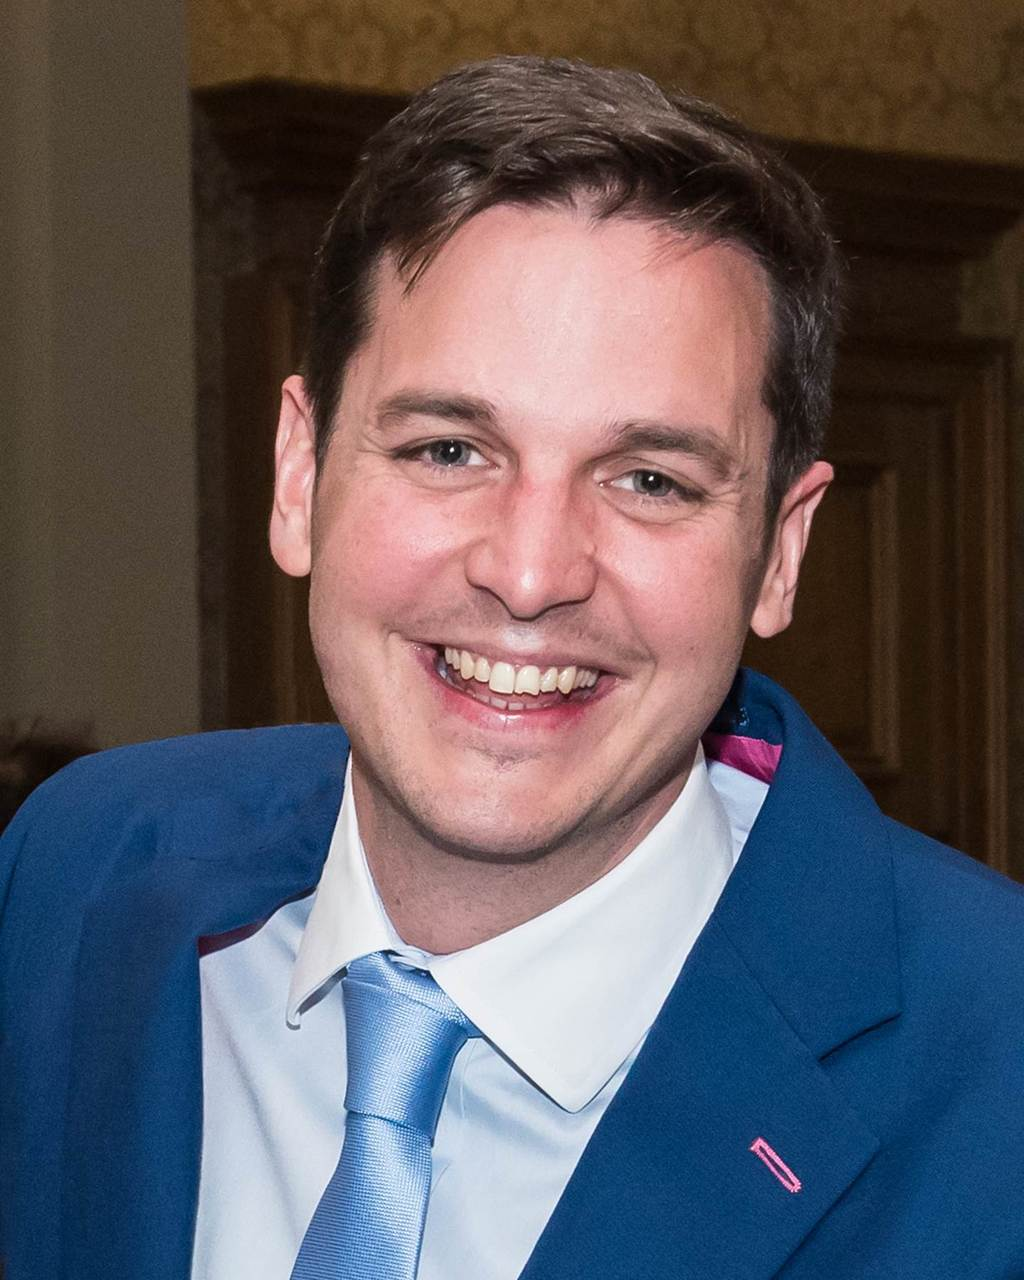 Simon Maguire